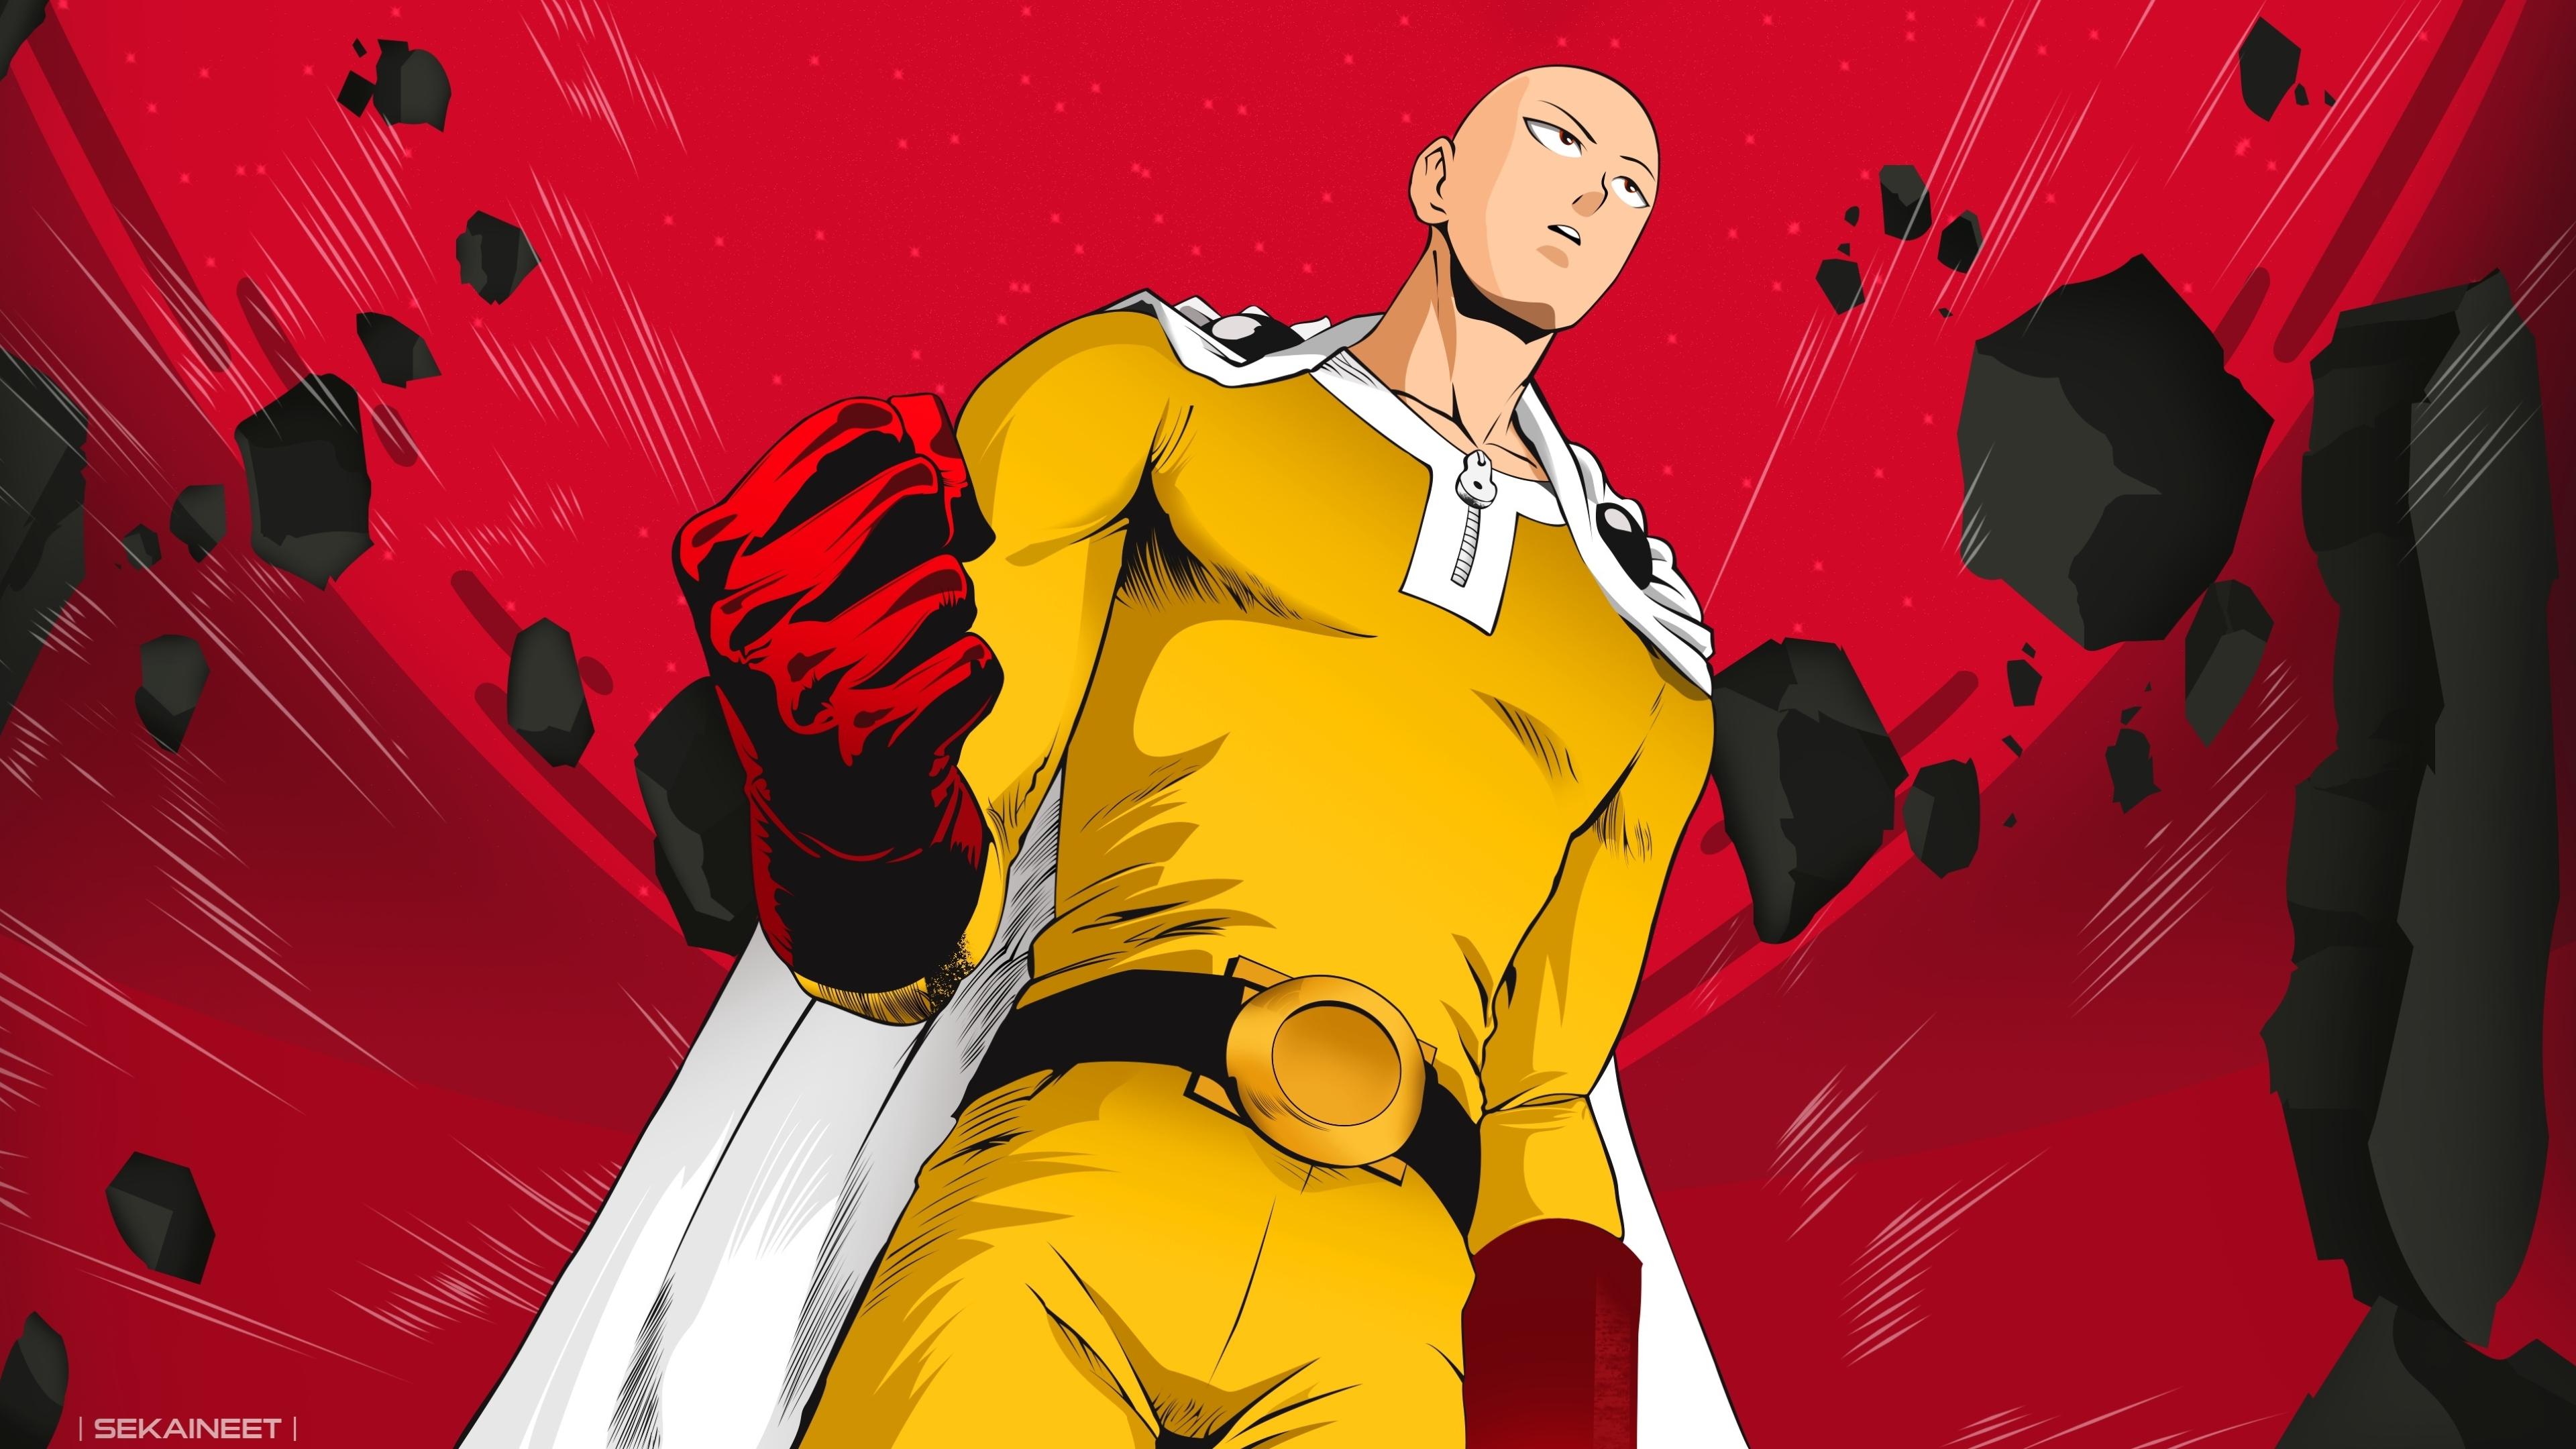 3840x2160 Saitama In One Punch Man 4k Wallpaper Hd Anime 4k